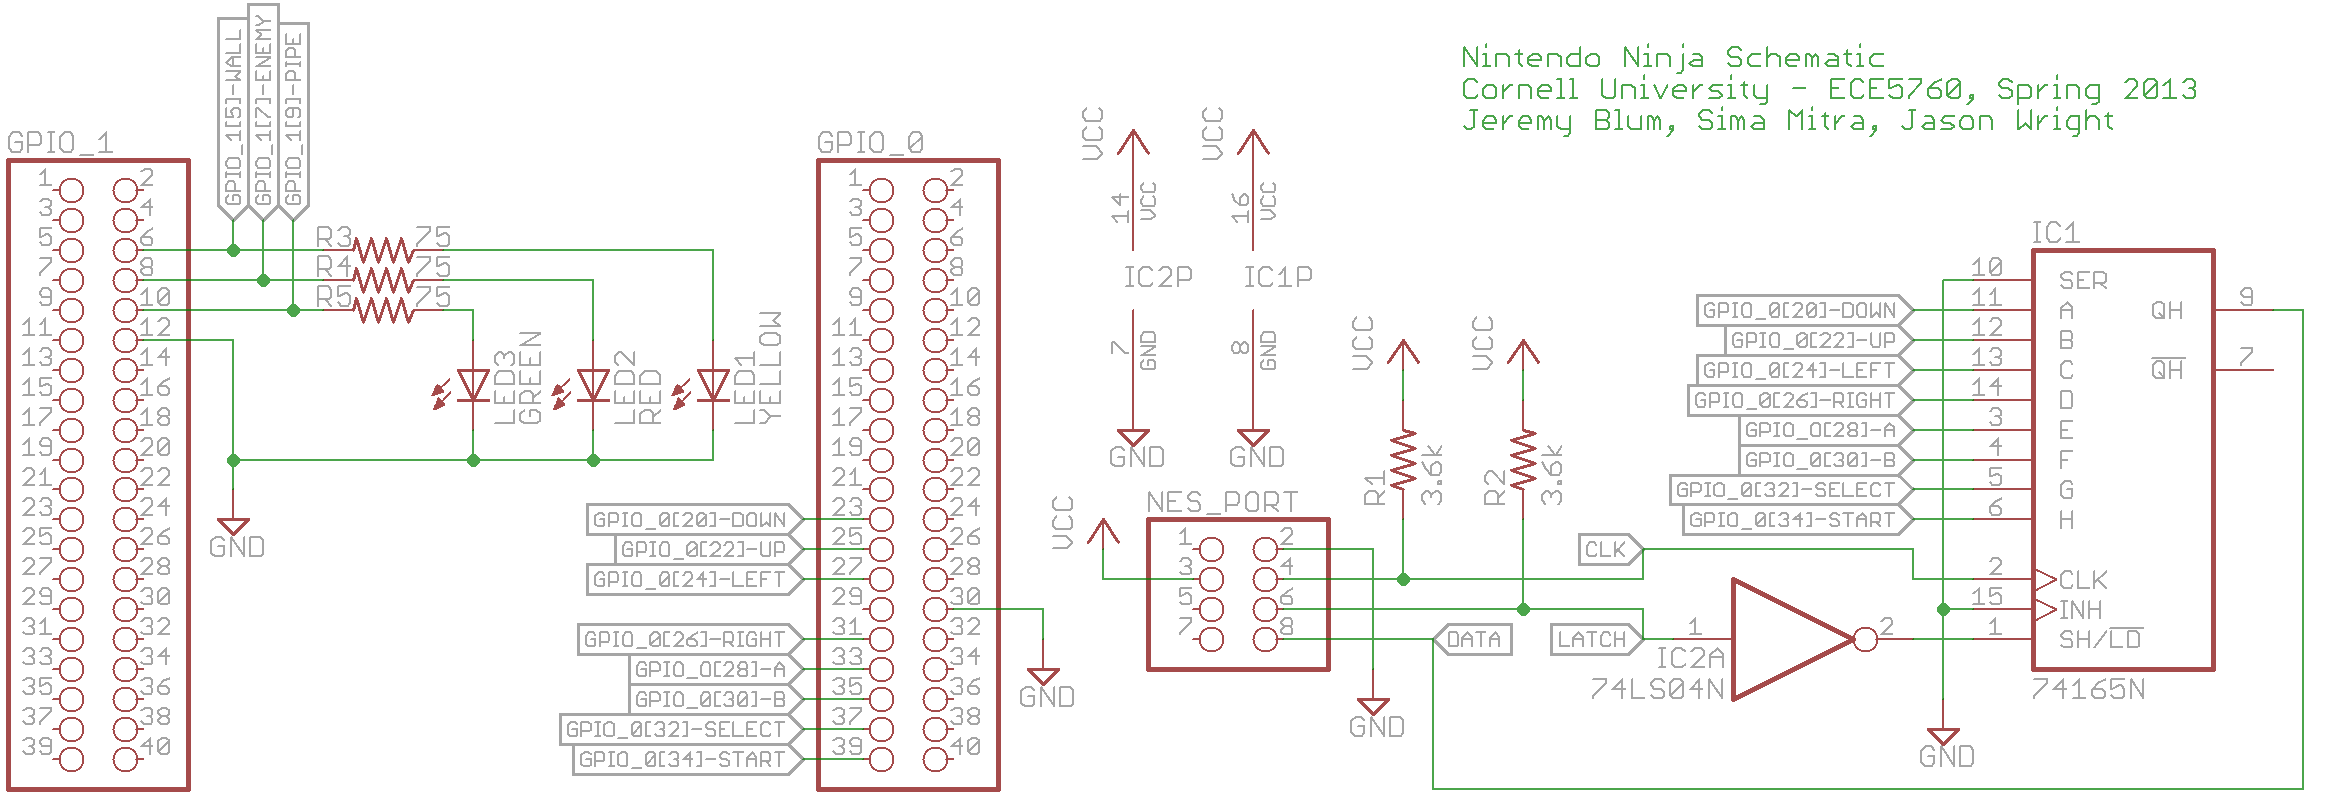 Nintendo Ninja | An FPGA-Based Mario Bros. A.I.